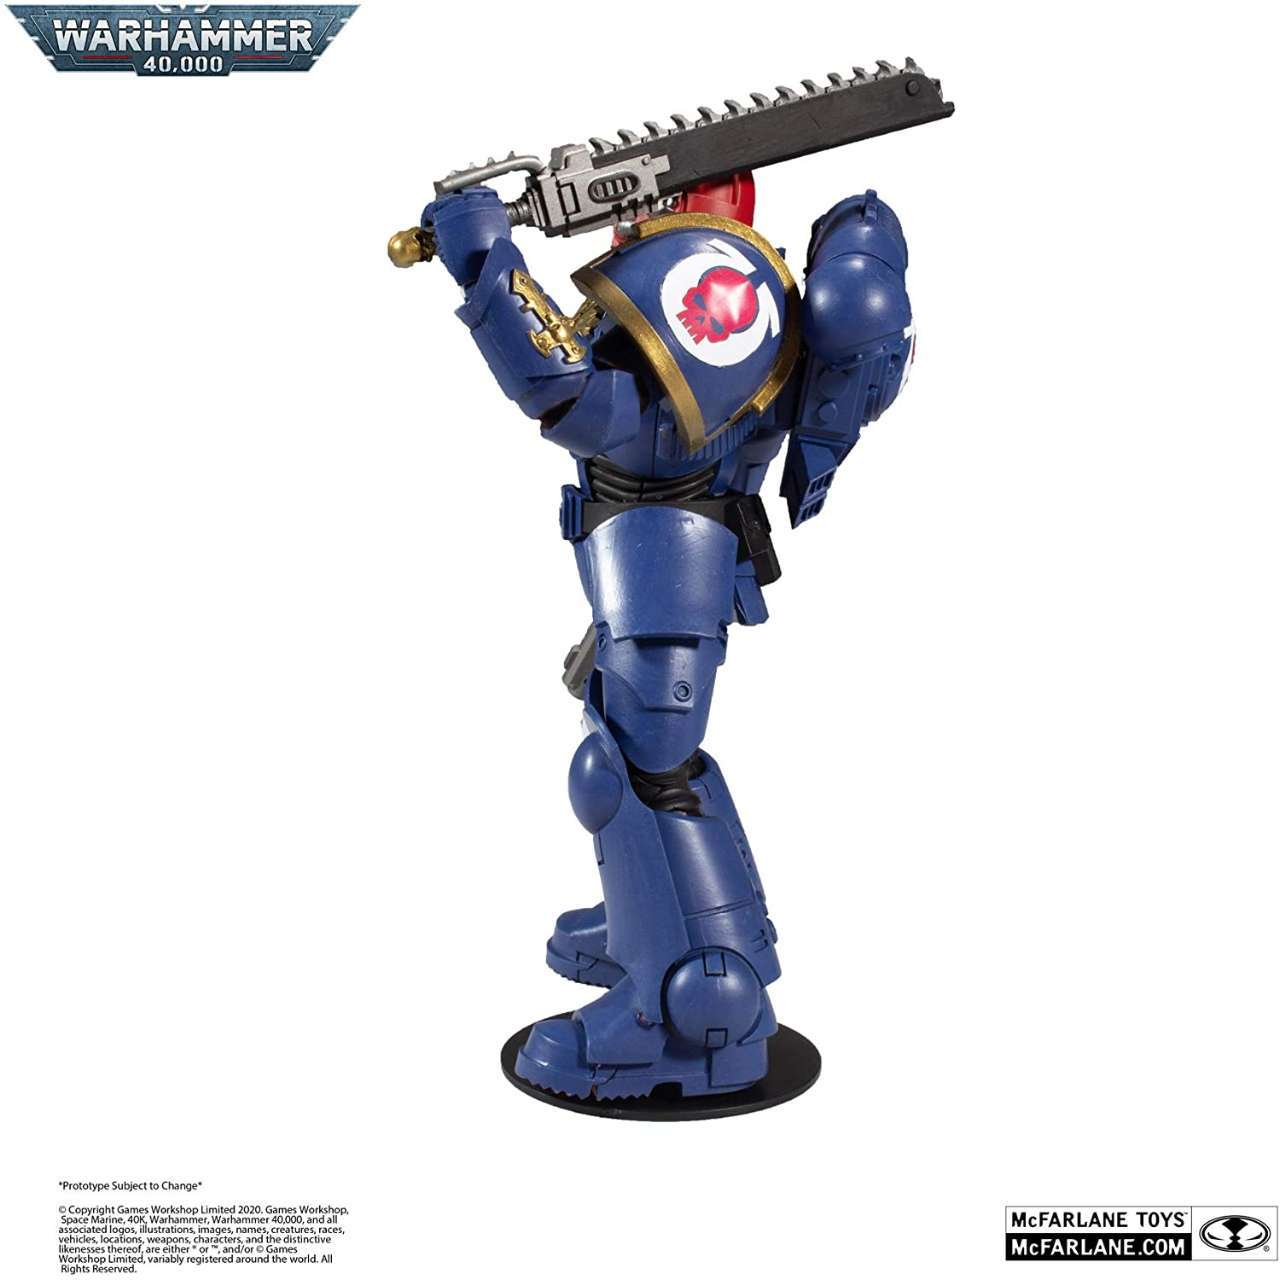 mcfarlane-warhammer-4000071YF7bVmokL_AC_SL1500_